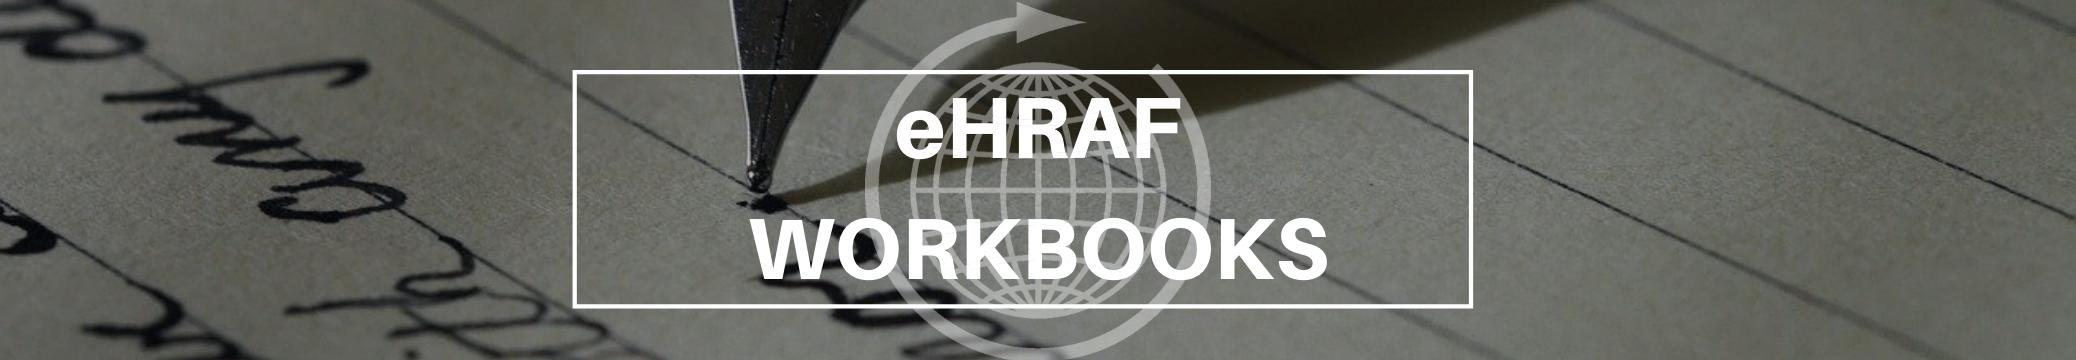 eHRAF Workbooks banner